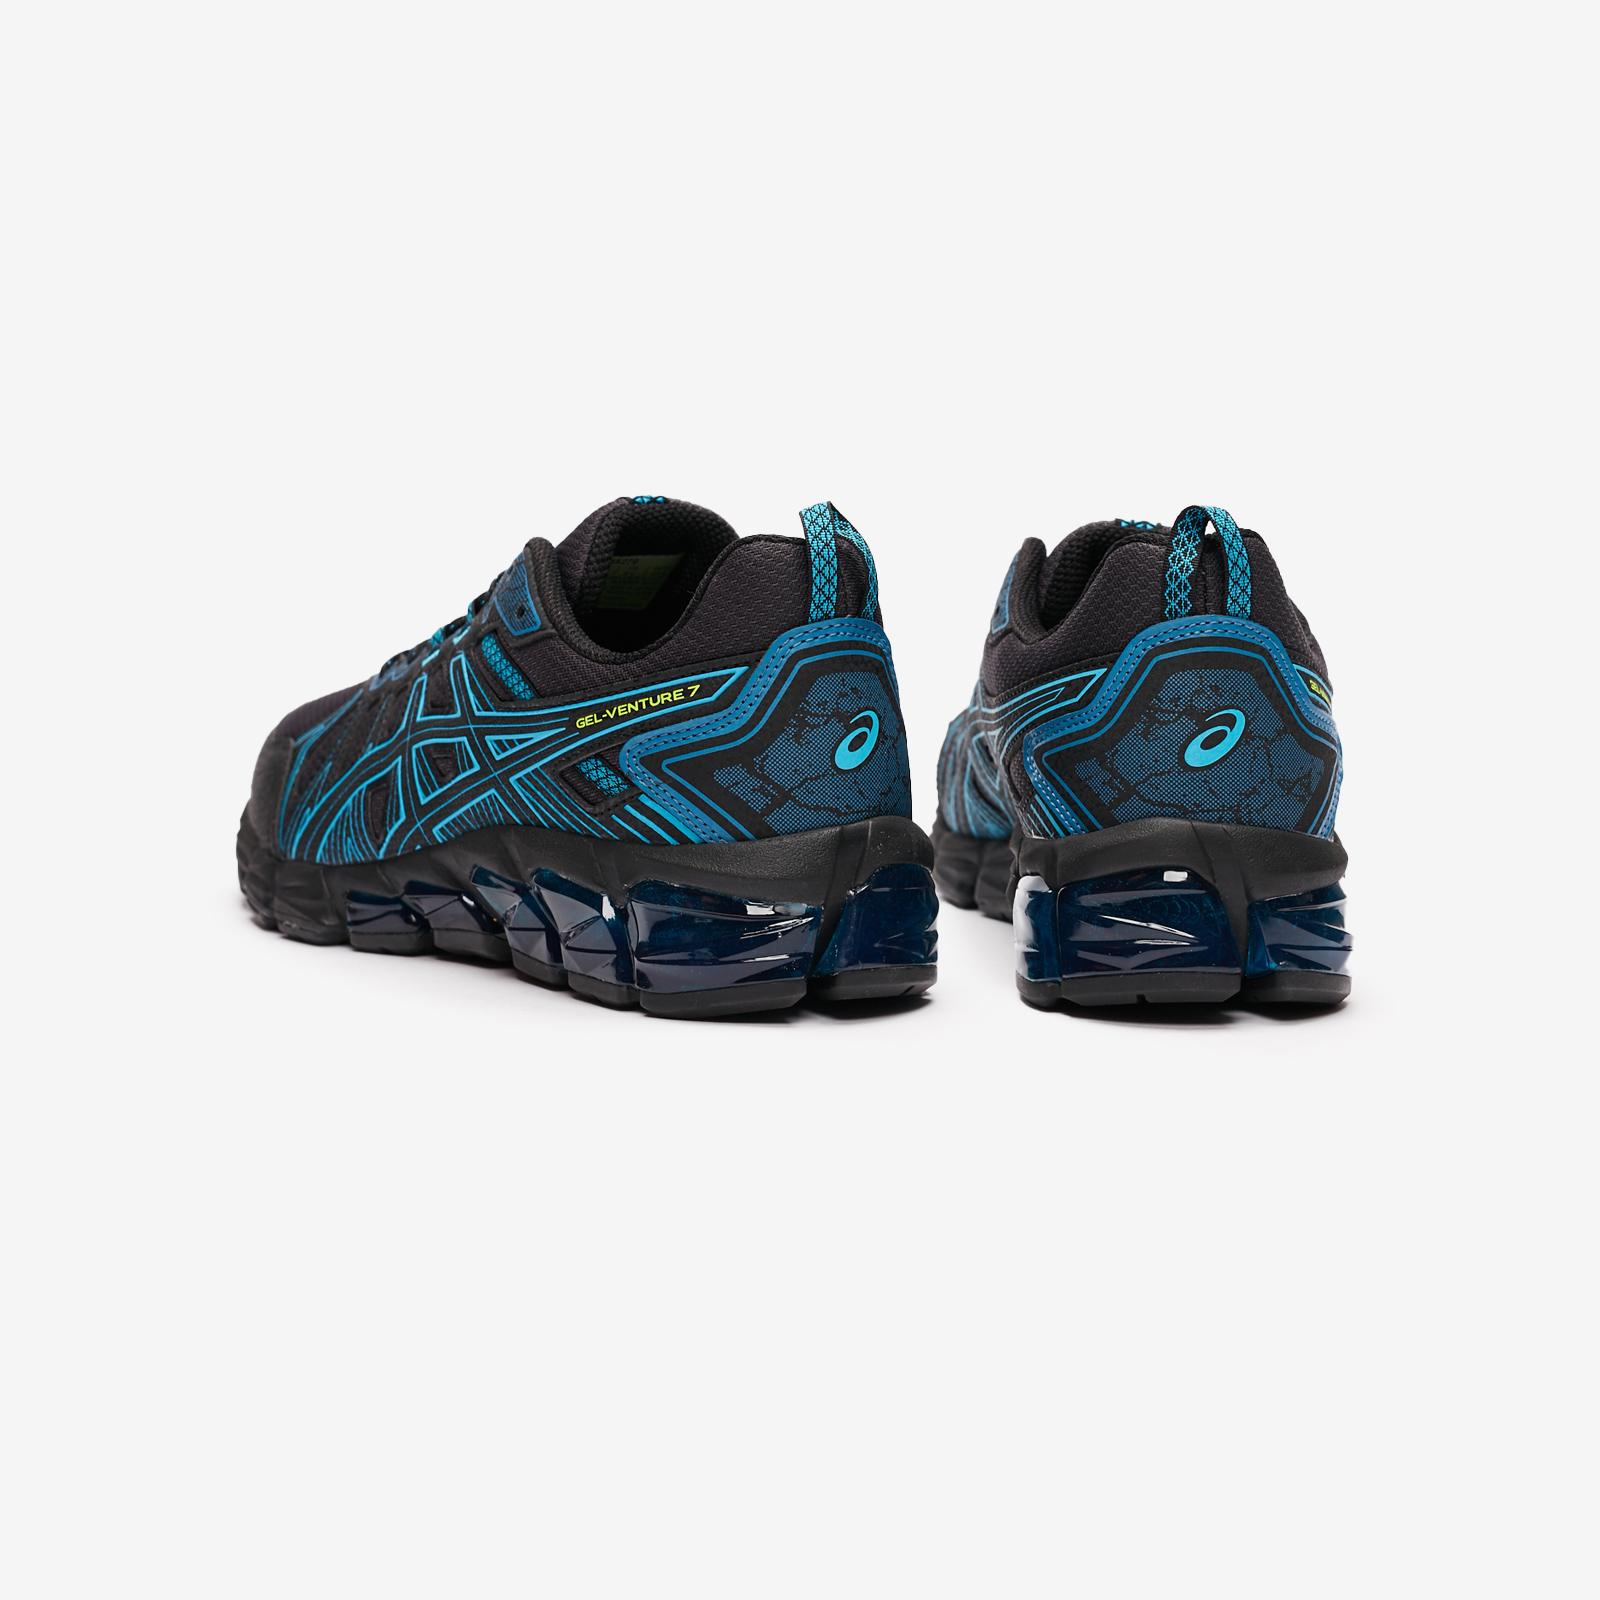 Asics Sportstyle Gel-Venture 180 - 1201a279-004 - SNS | sneakers ...